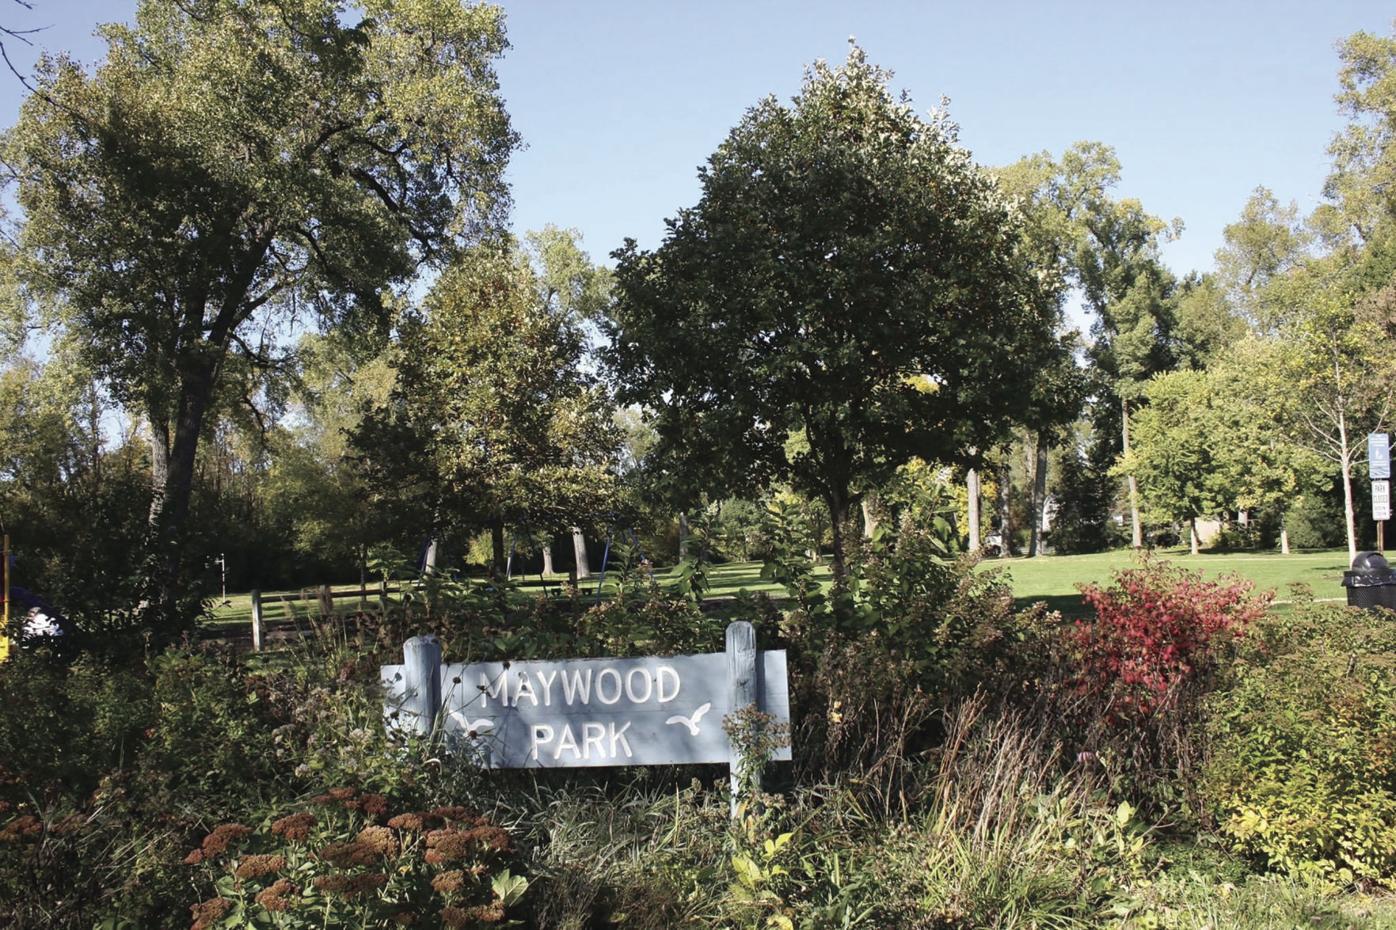 Maywood Park entrance